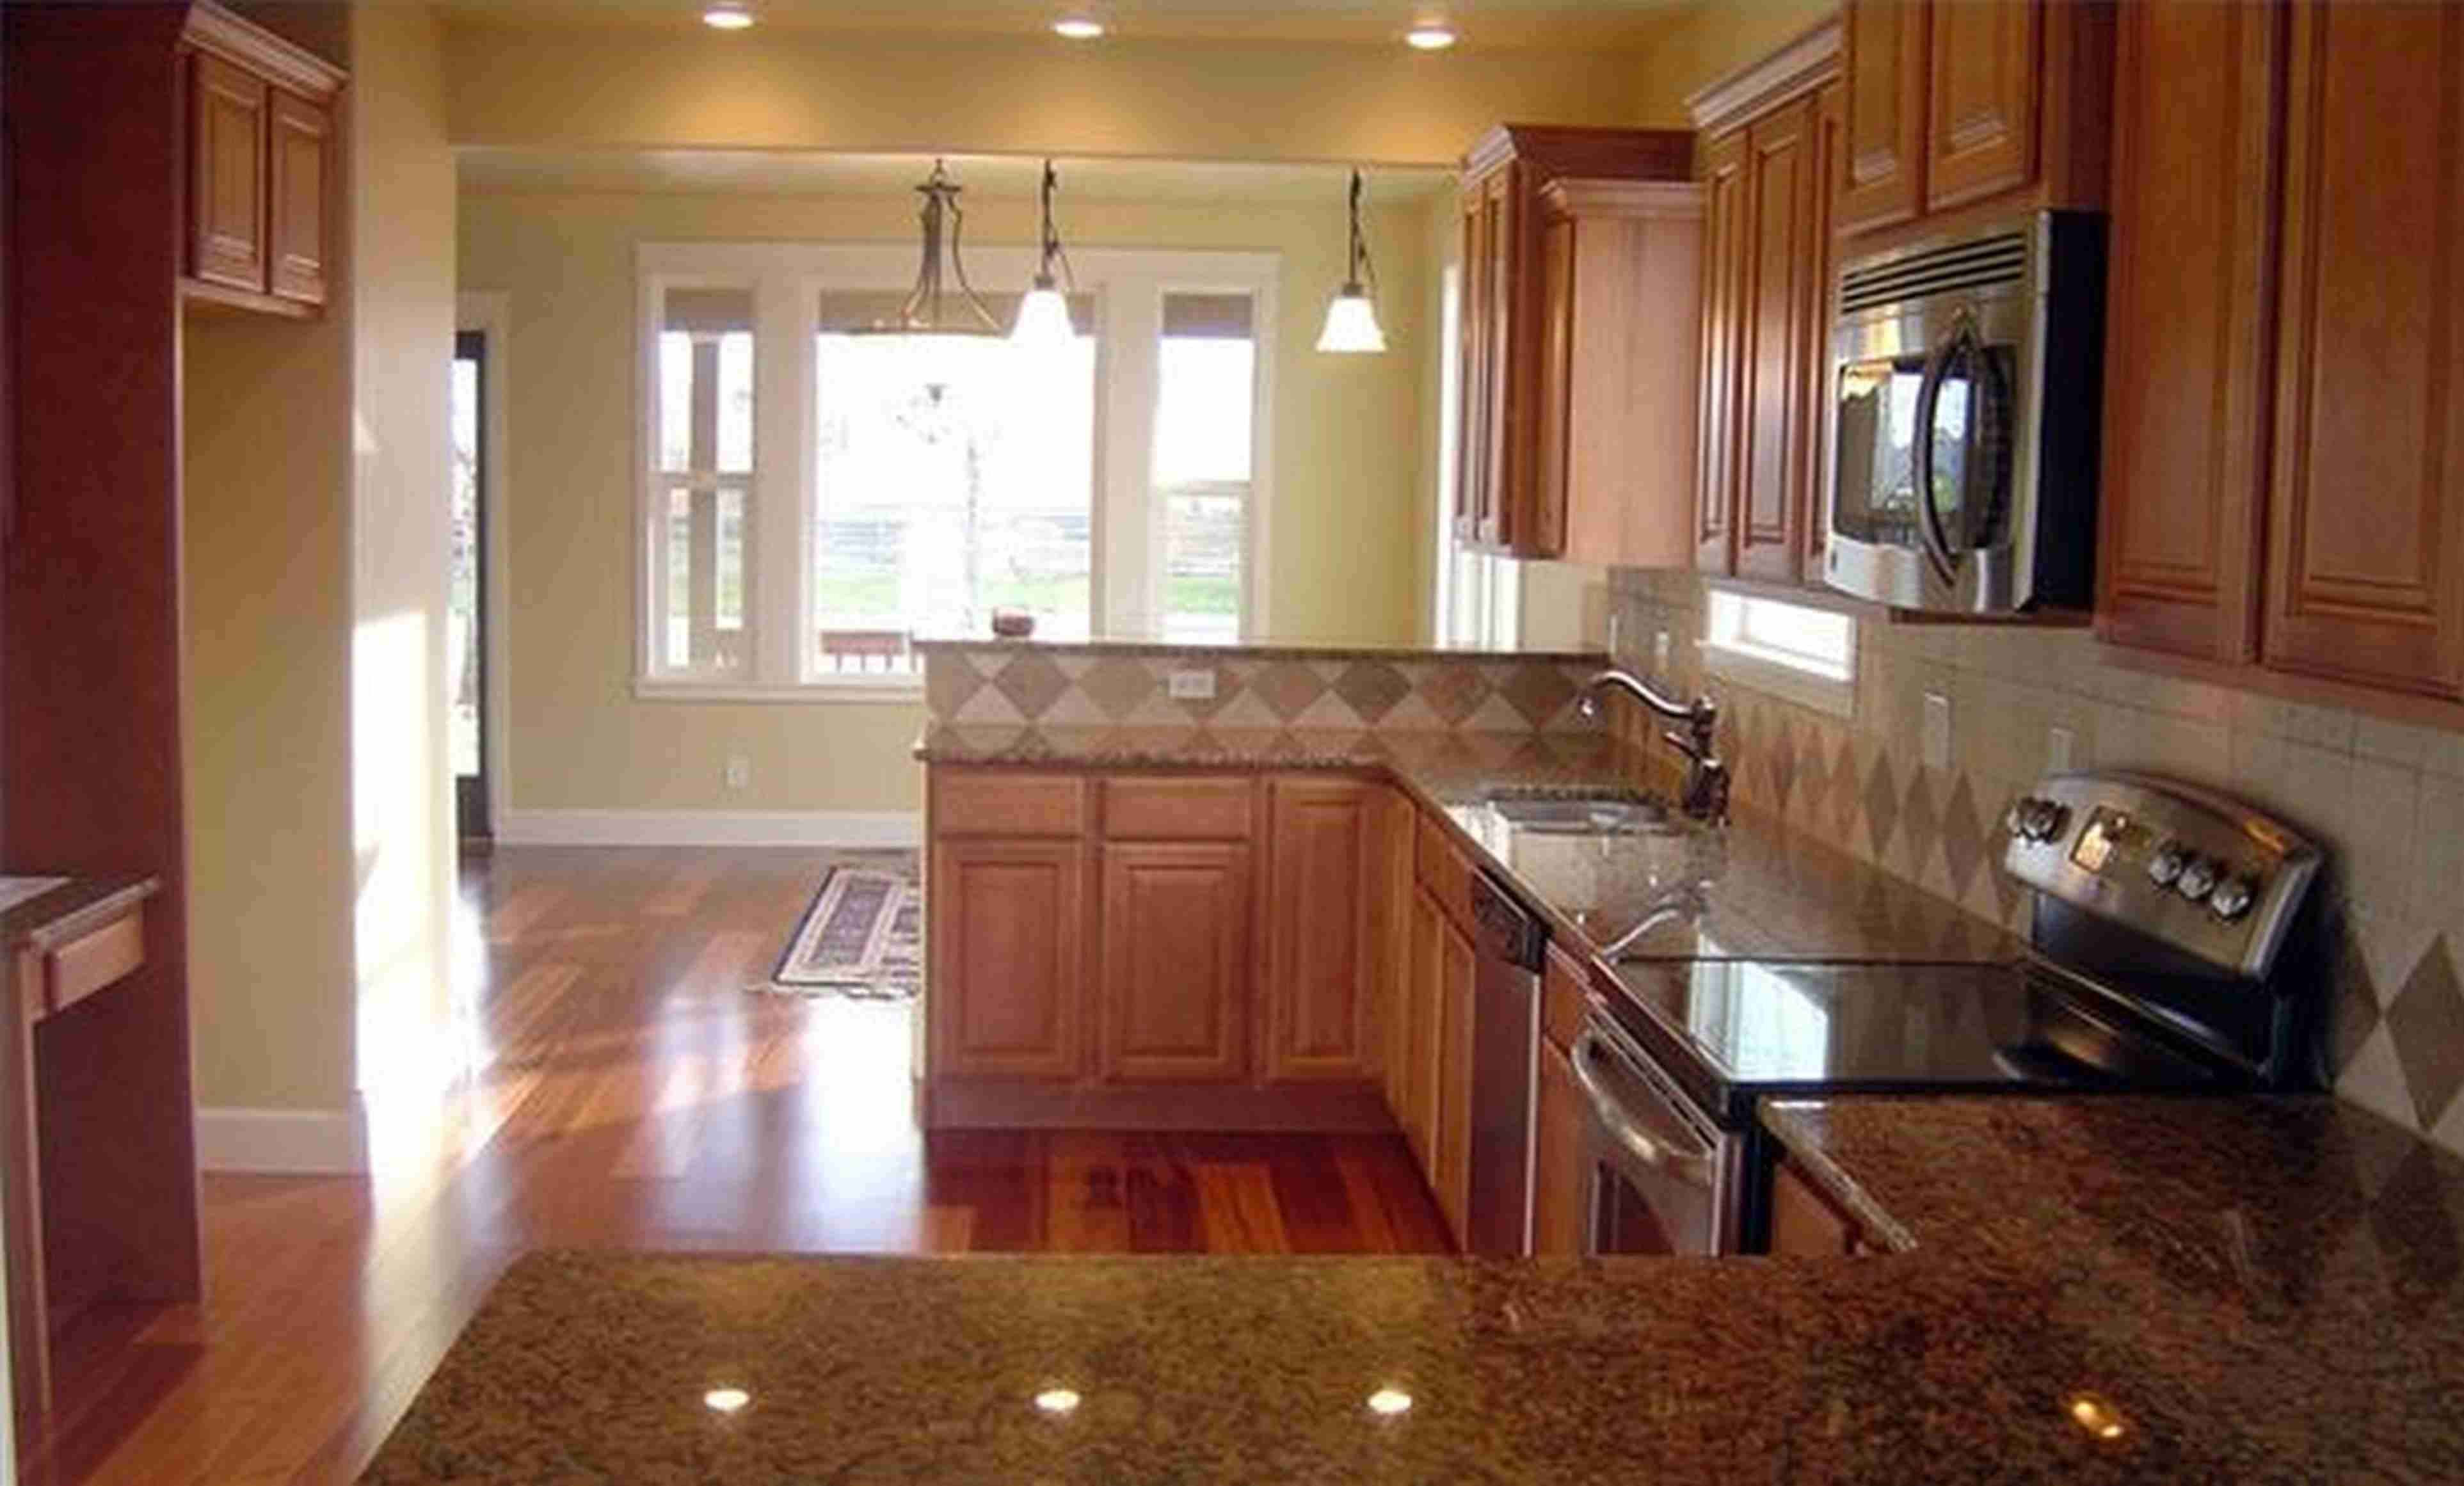 Best ideas about Lowes Kitchen Ideas . Save or Pin Kitchen Decoration Lowes Design Ideas Portfolio Review Now.